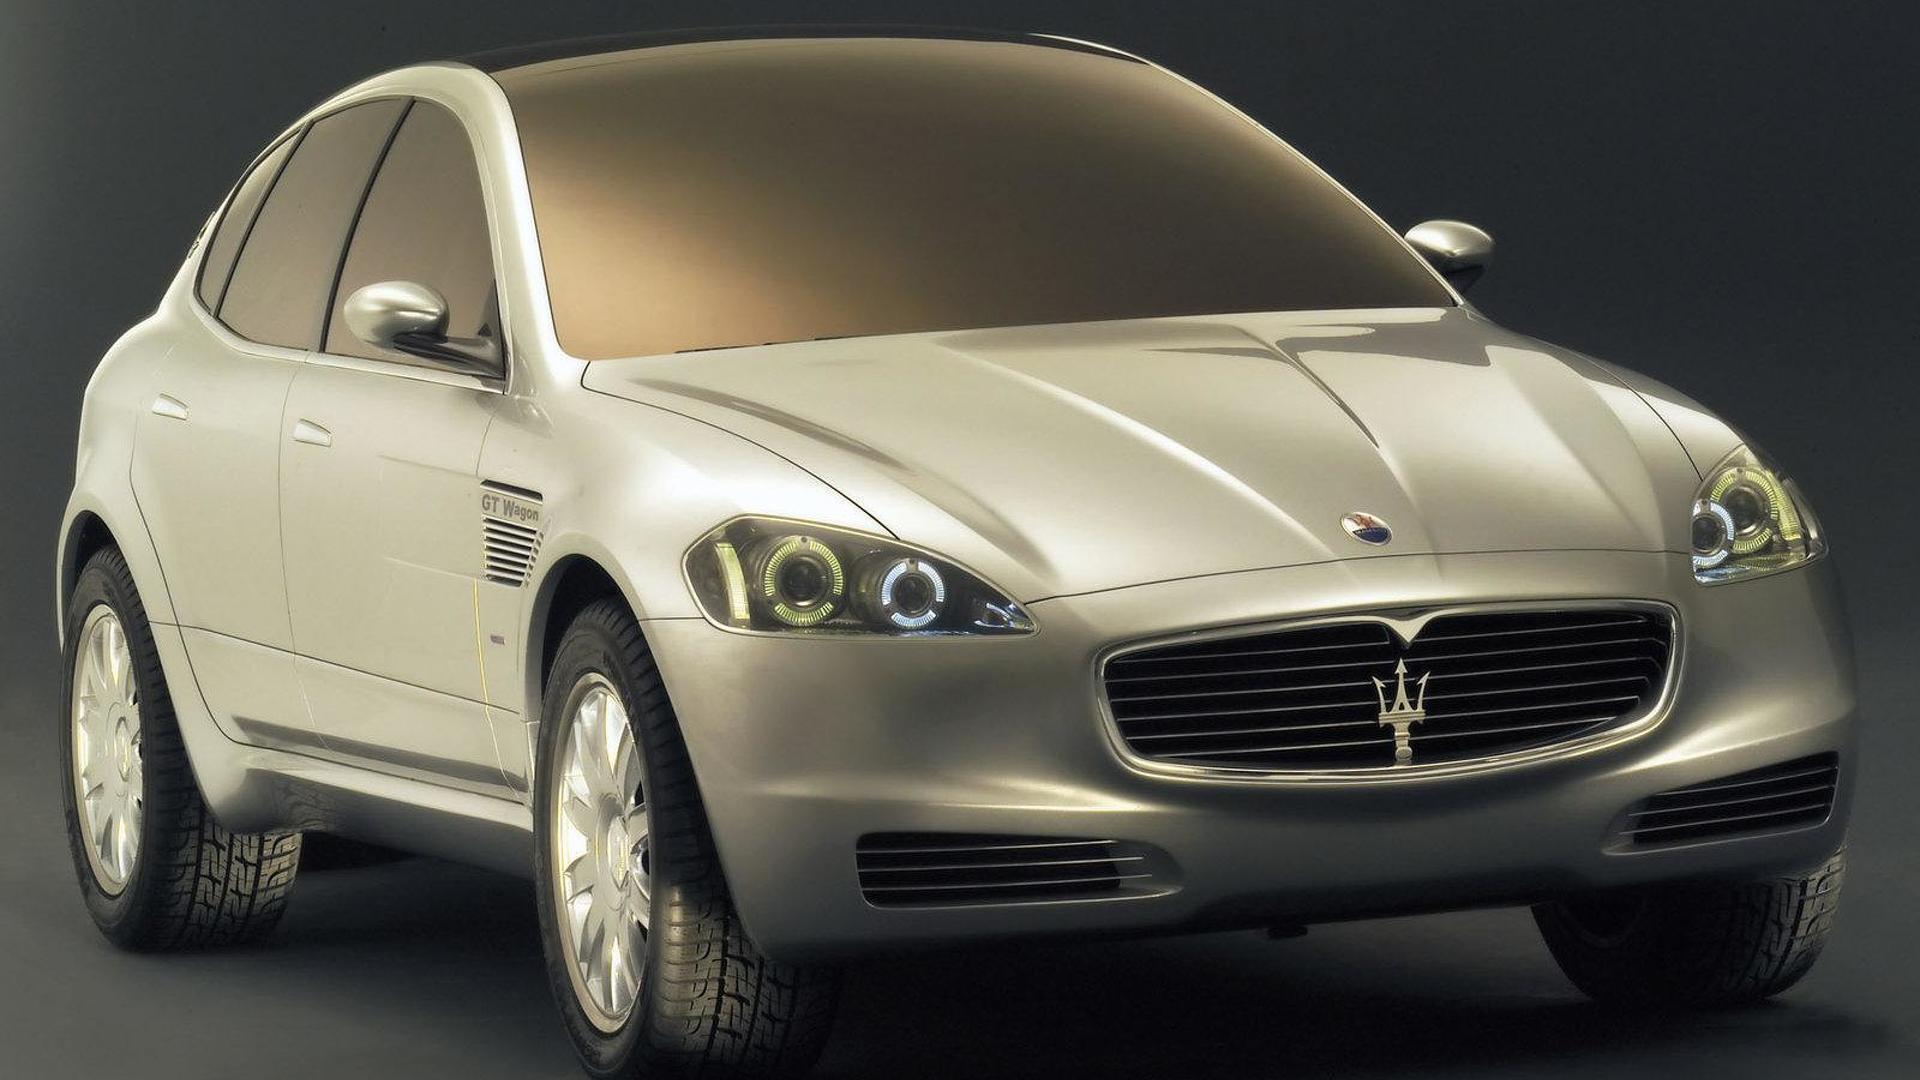 Maserati's future lineup gets detailed - rumors